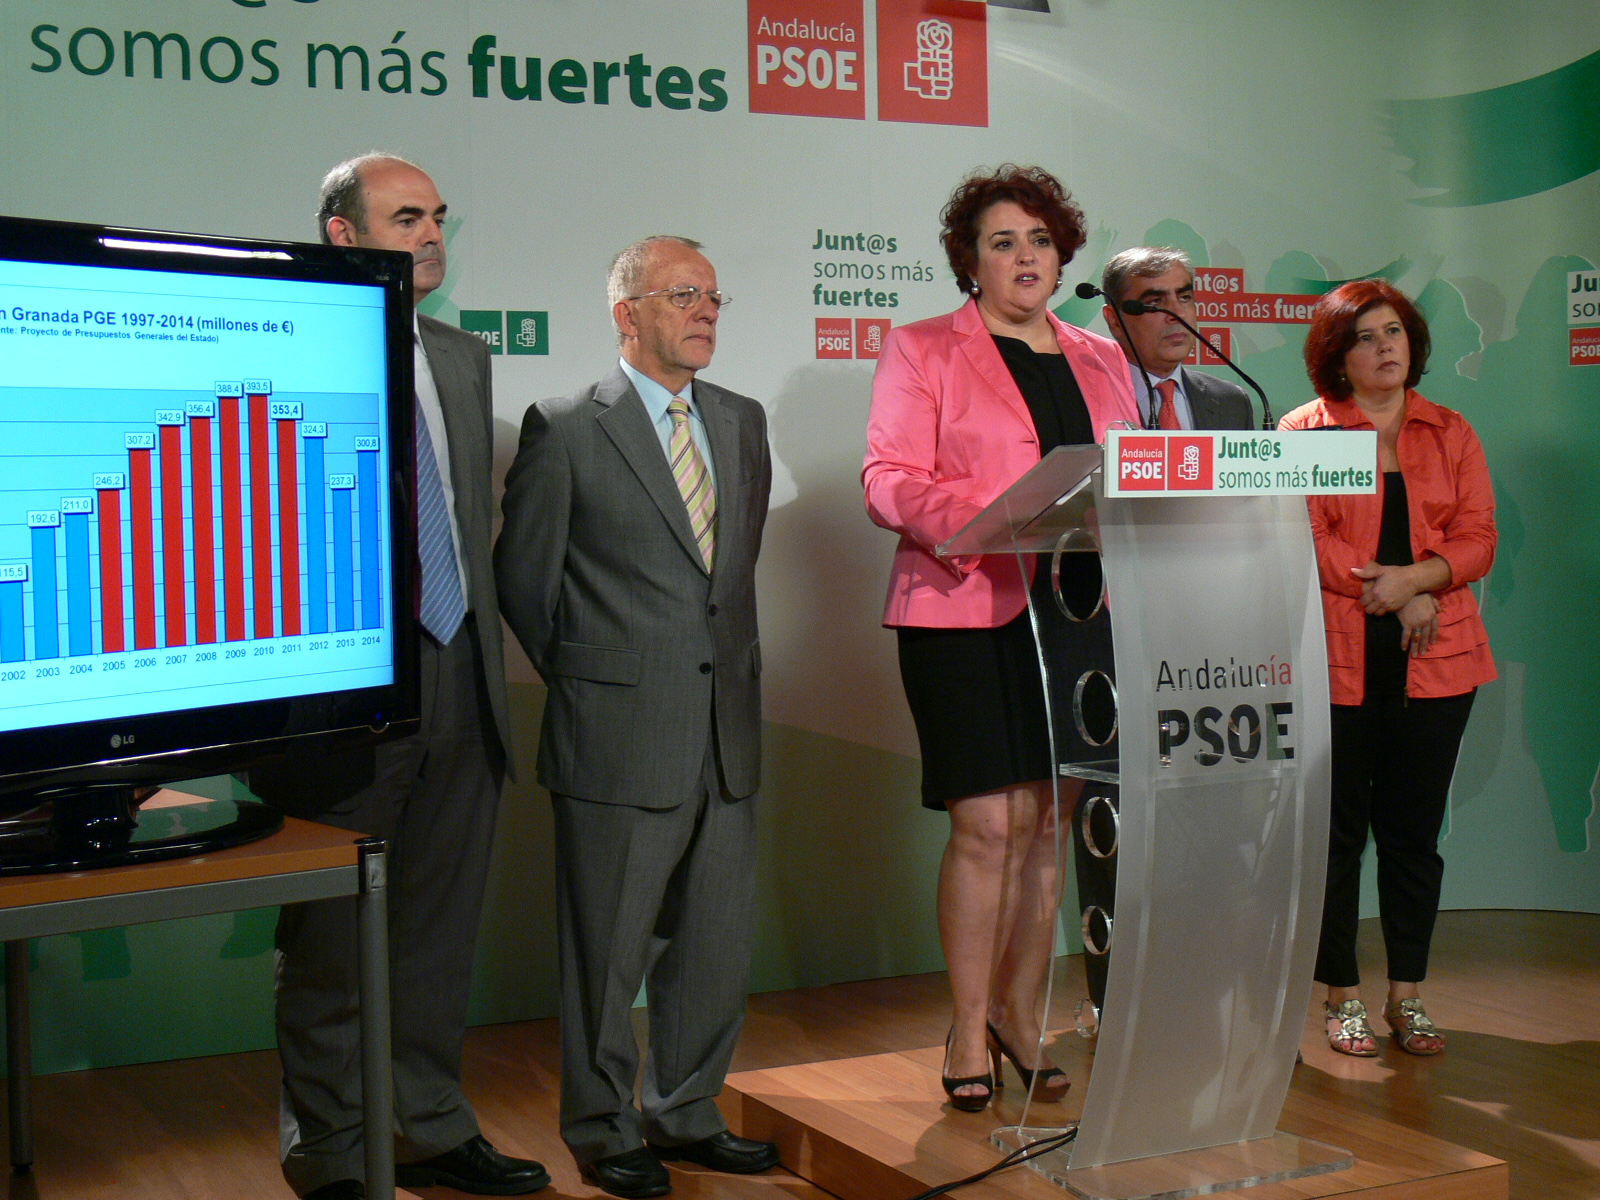 Teresa Jiménez y Parlamentarios 02